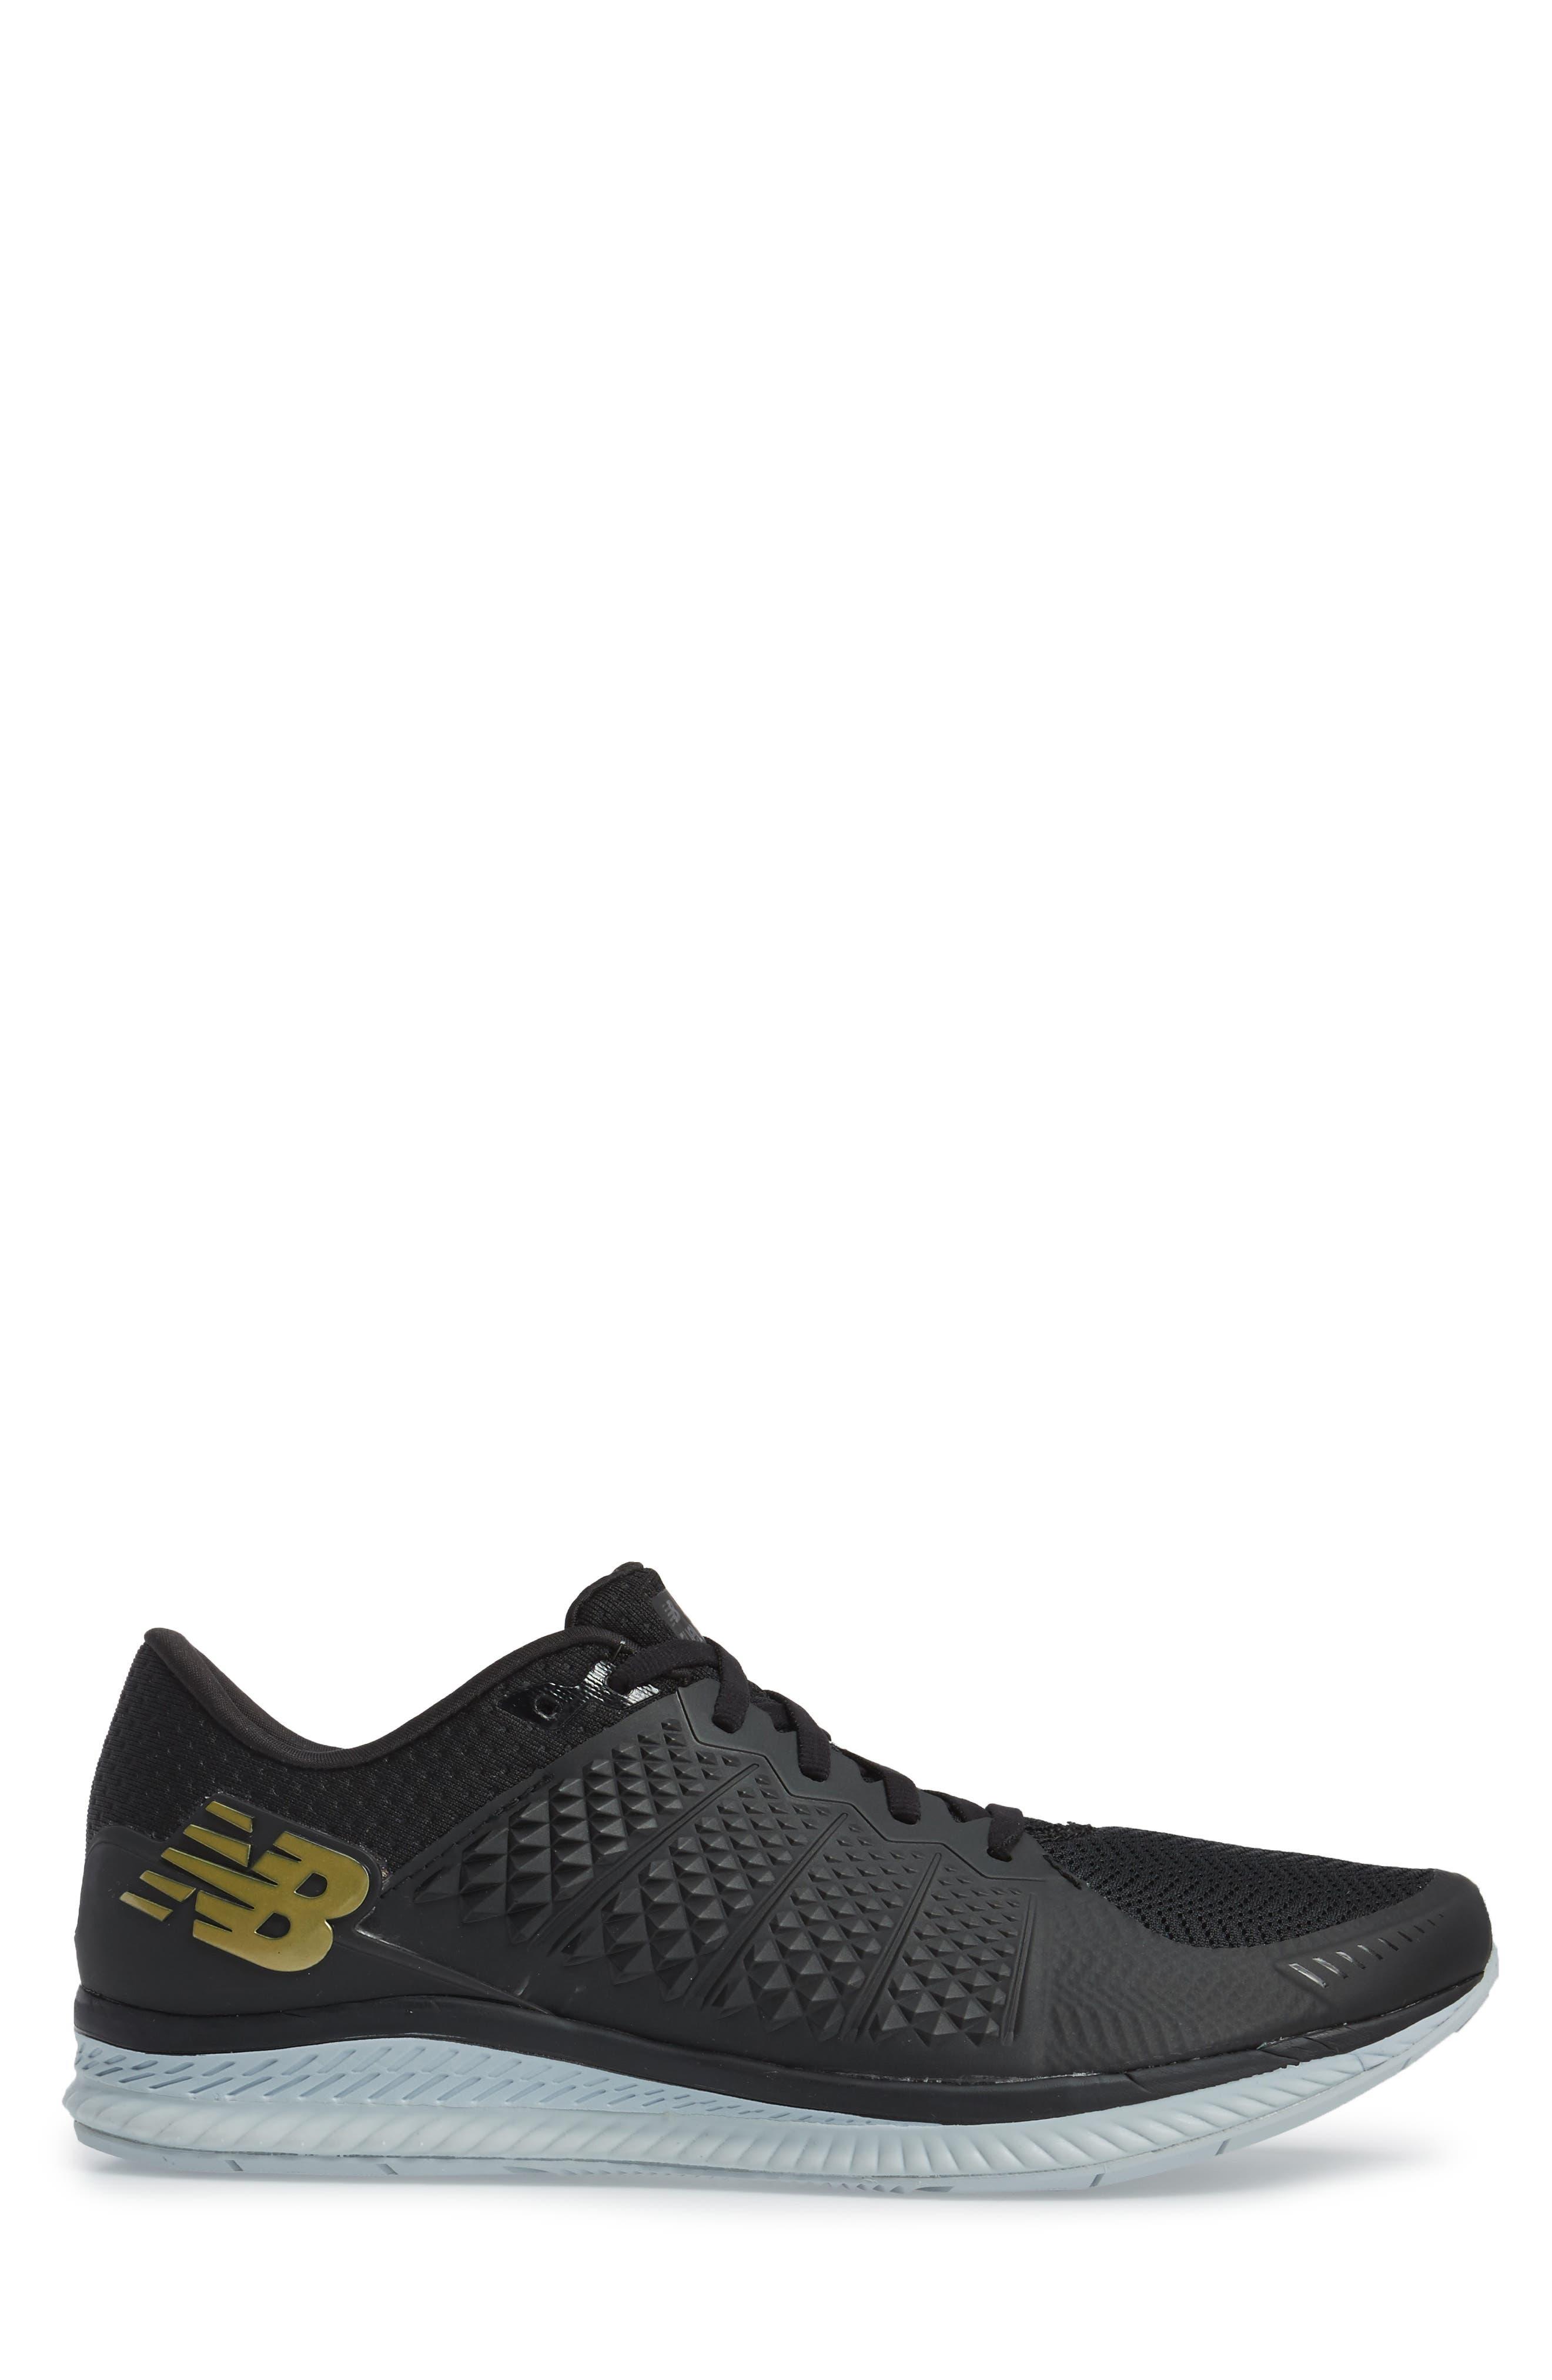 Vazee Fuel Cell Running Shoe,                             Alternate thumbnail 3, color,                             Black